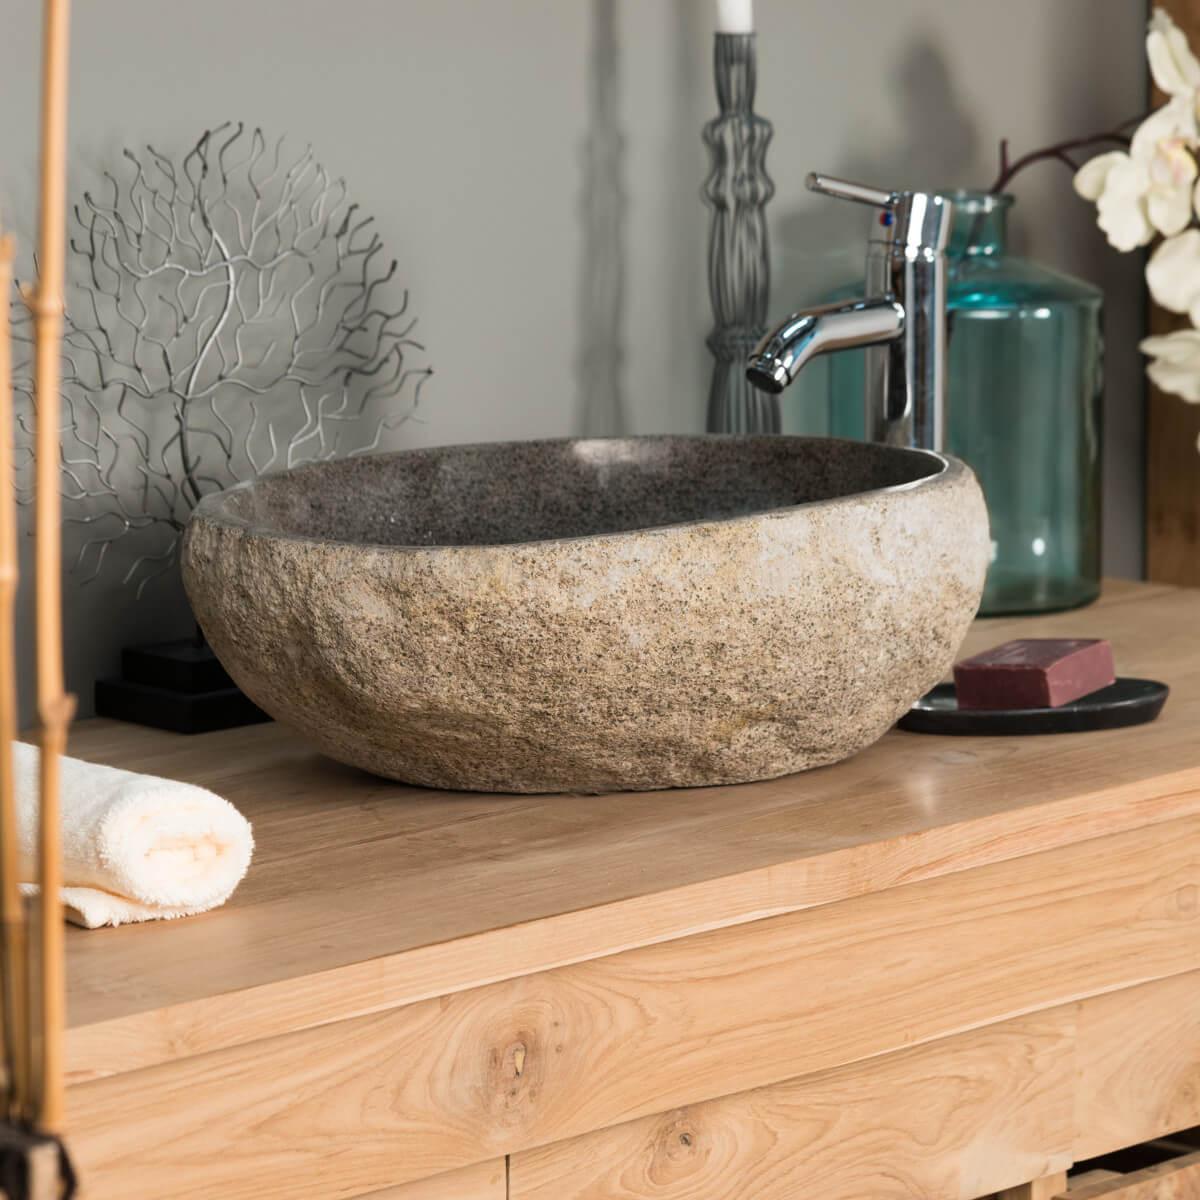 vasque en pierre